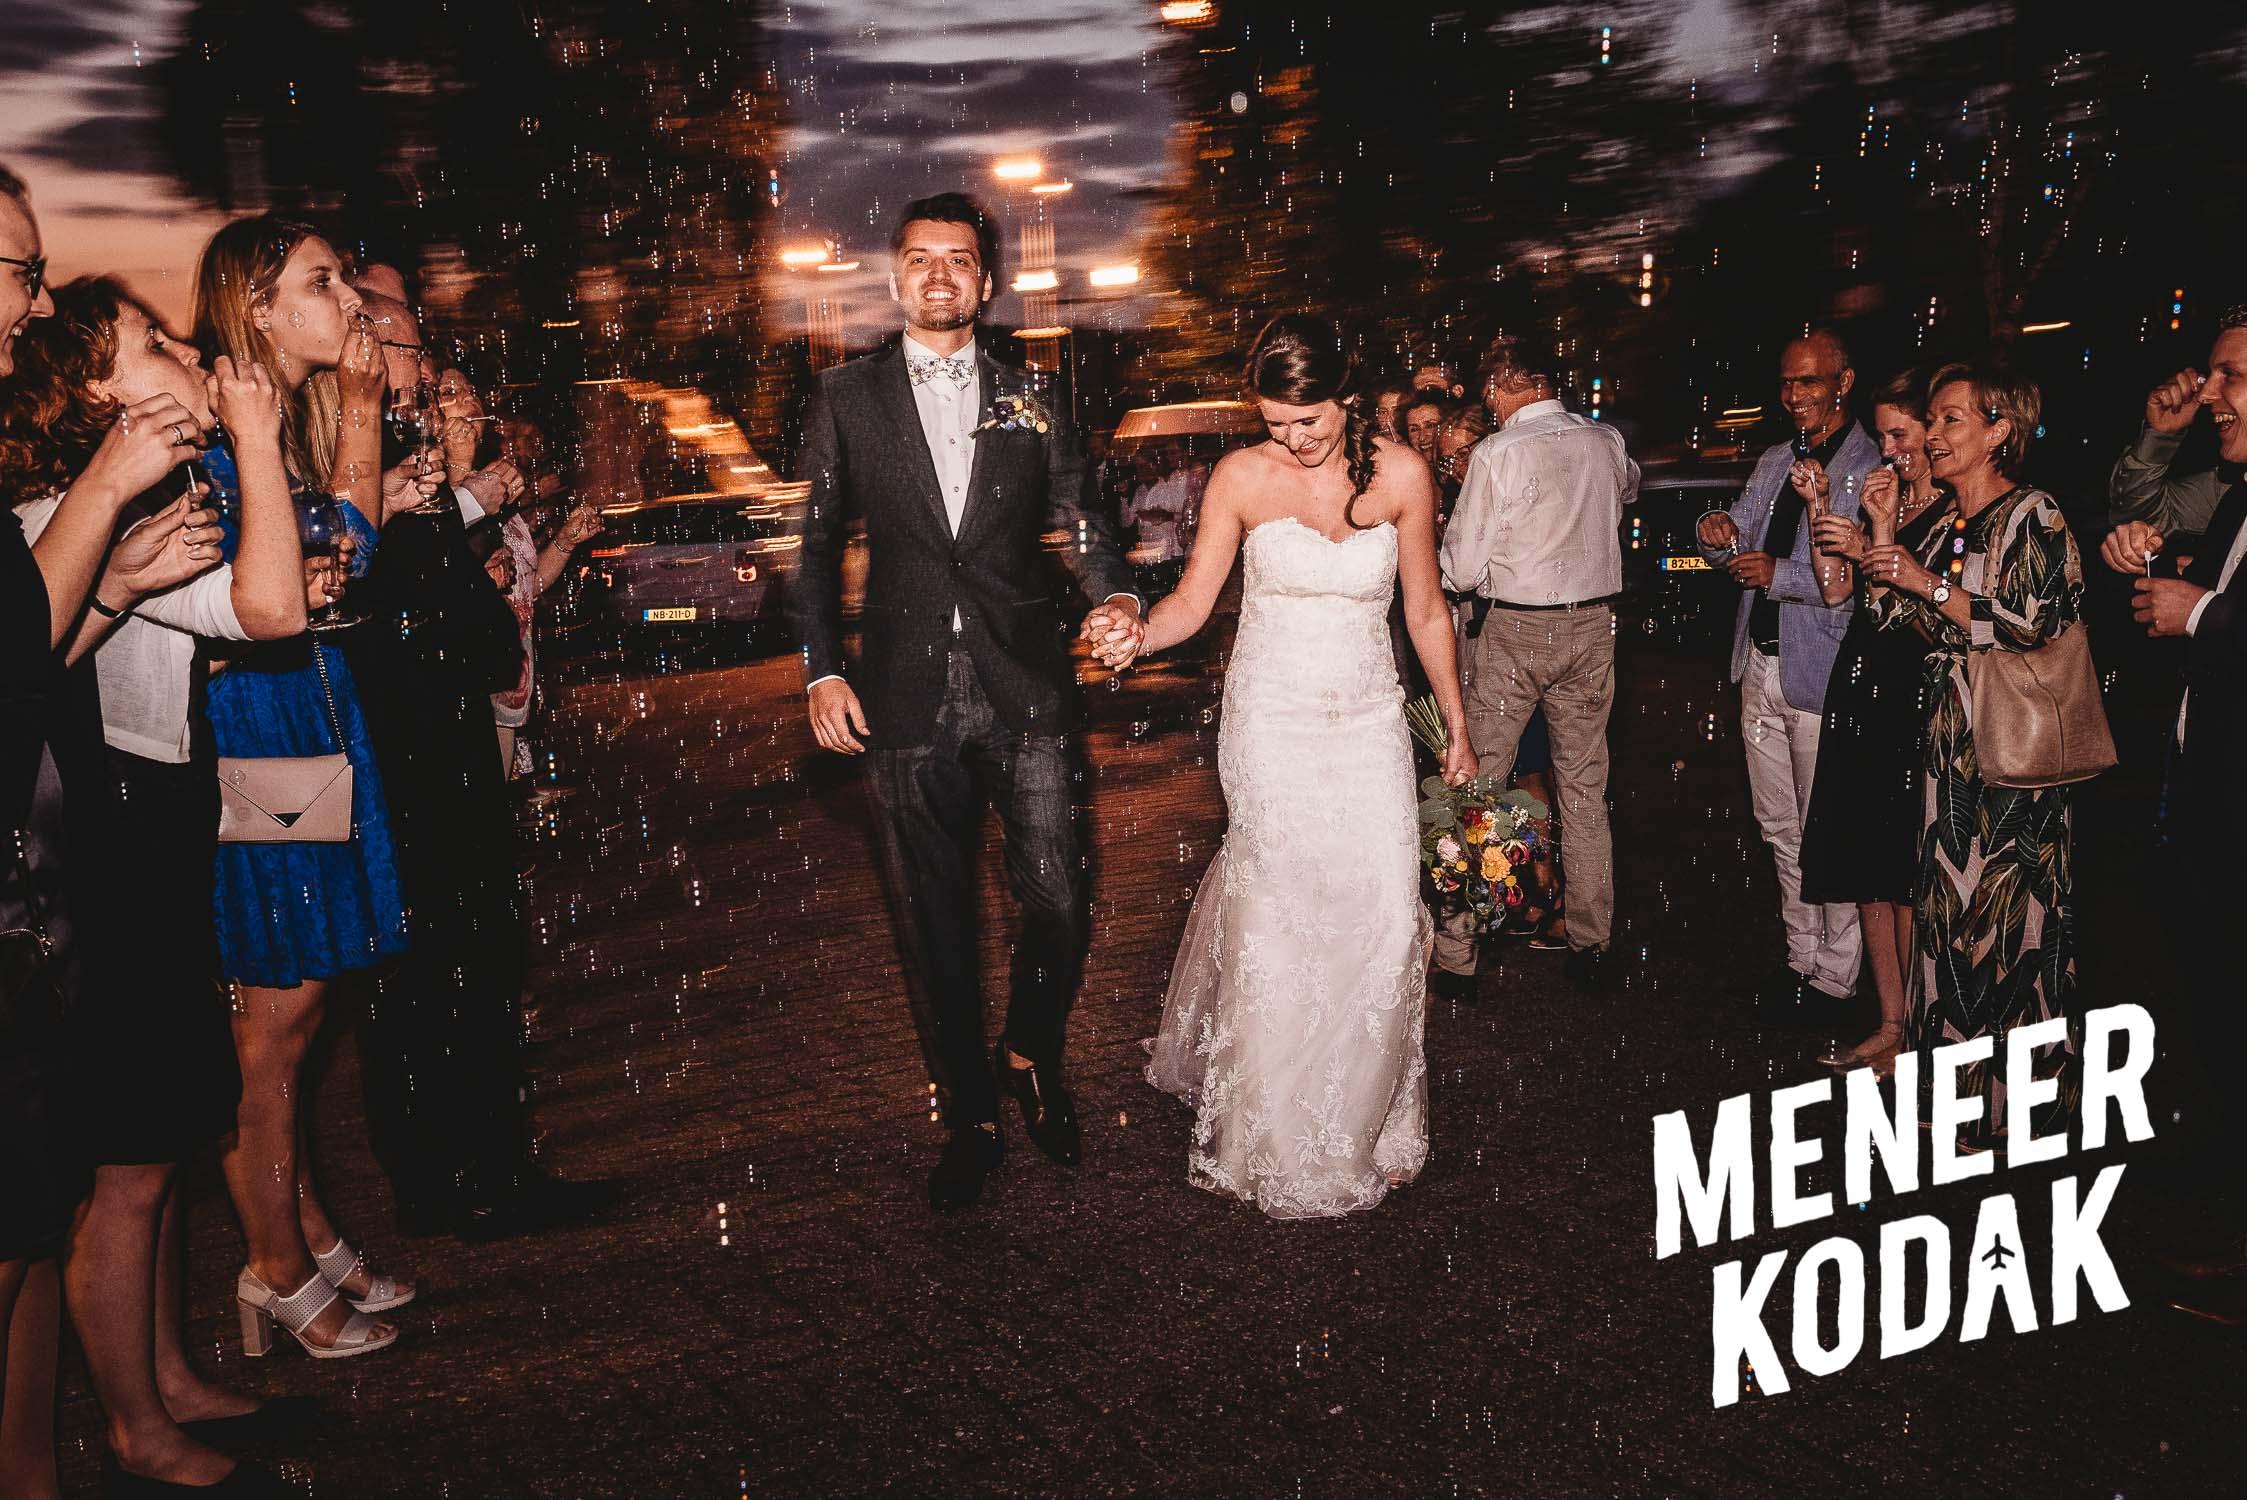 Meneer Kodak - Trouwreportage - Breda - E&M-134.jpg